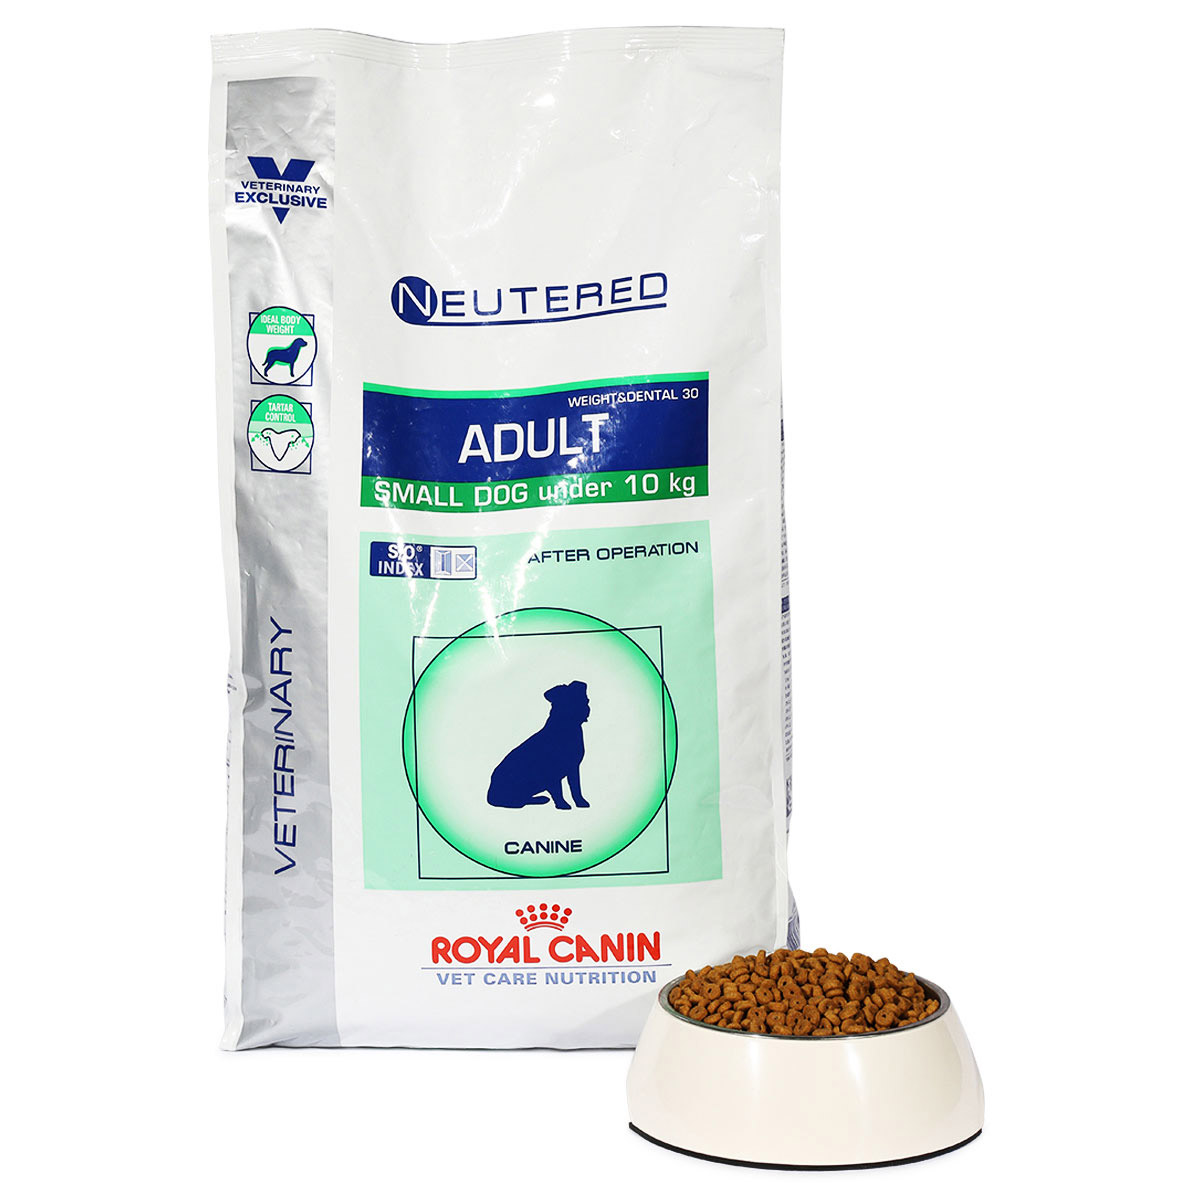 Royal Canin Neutered Small Dog